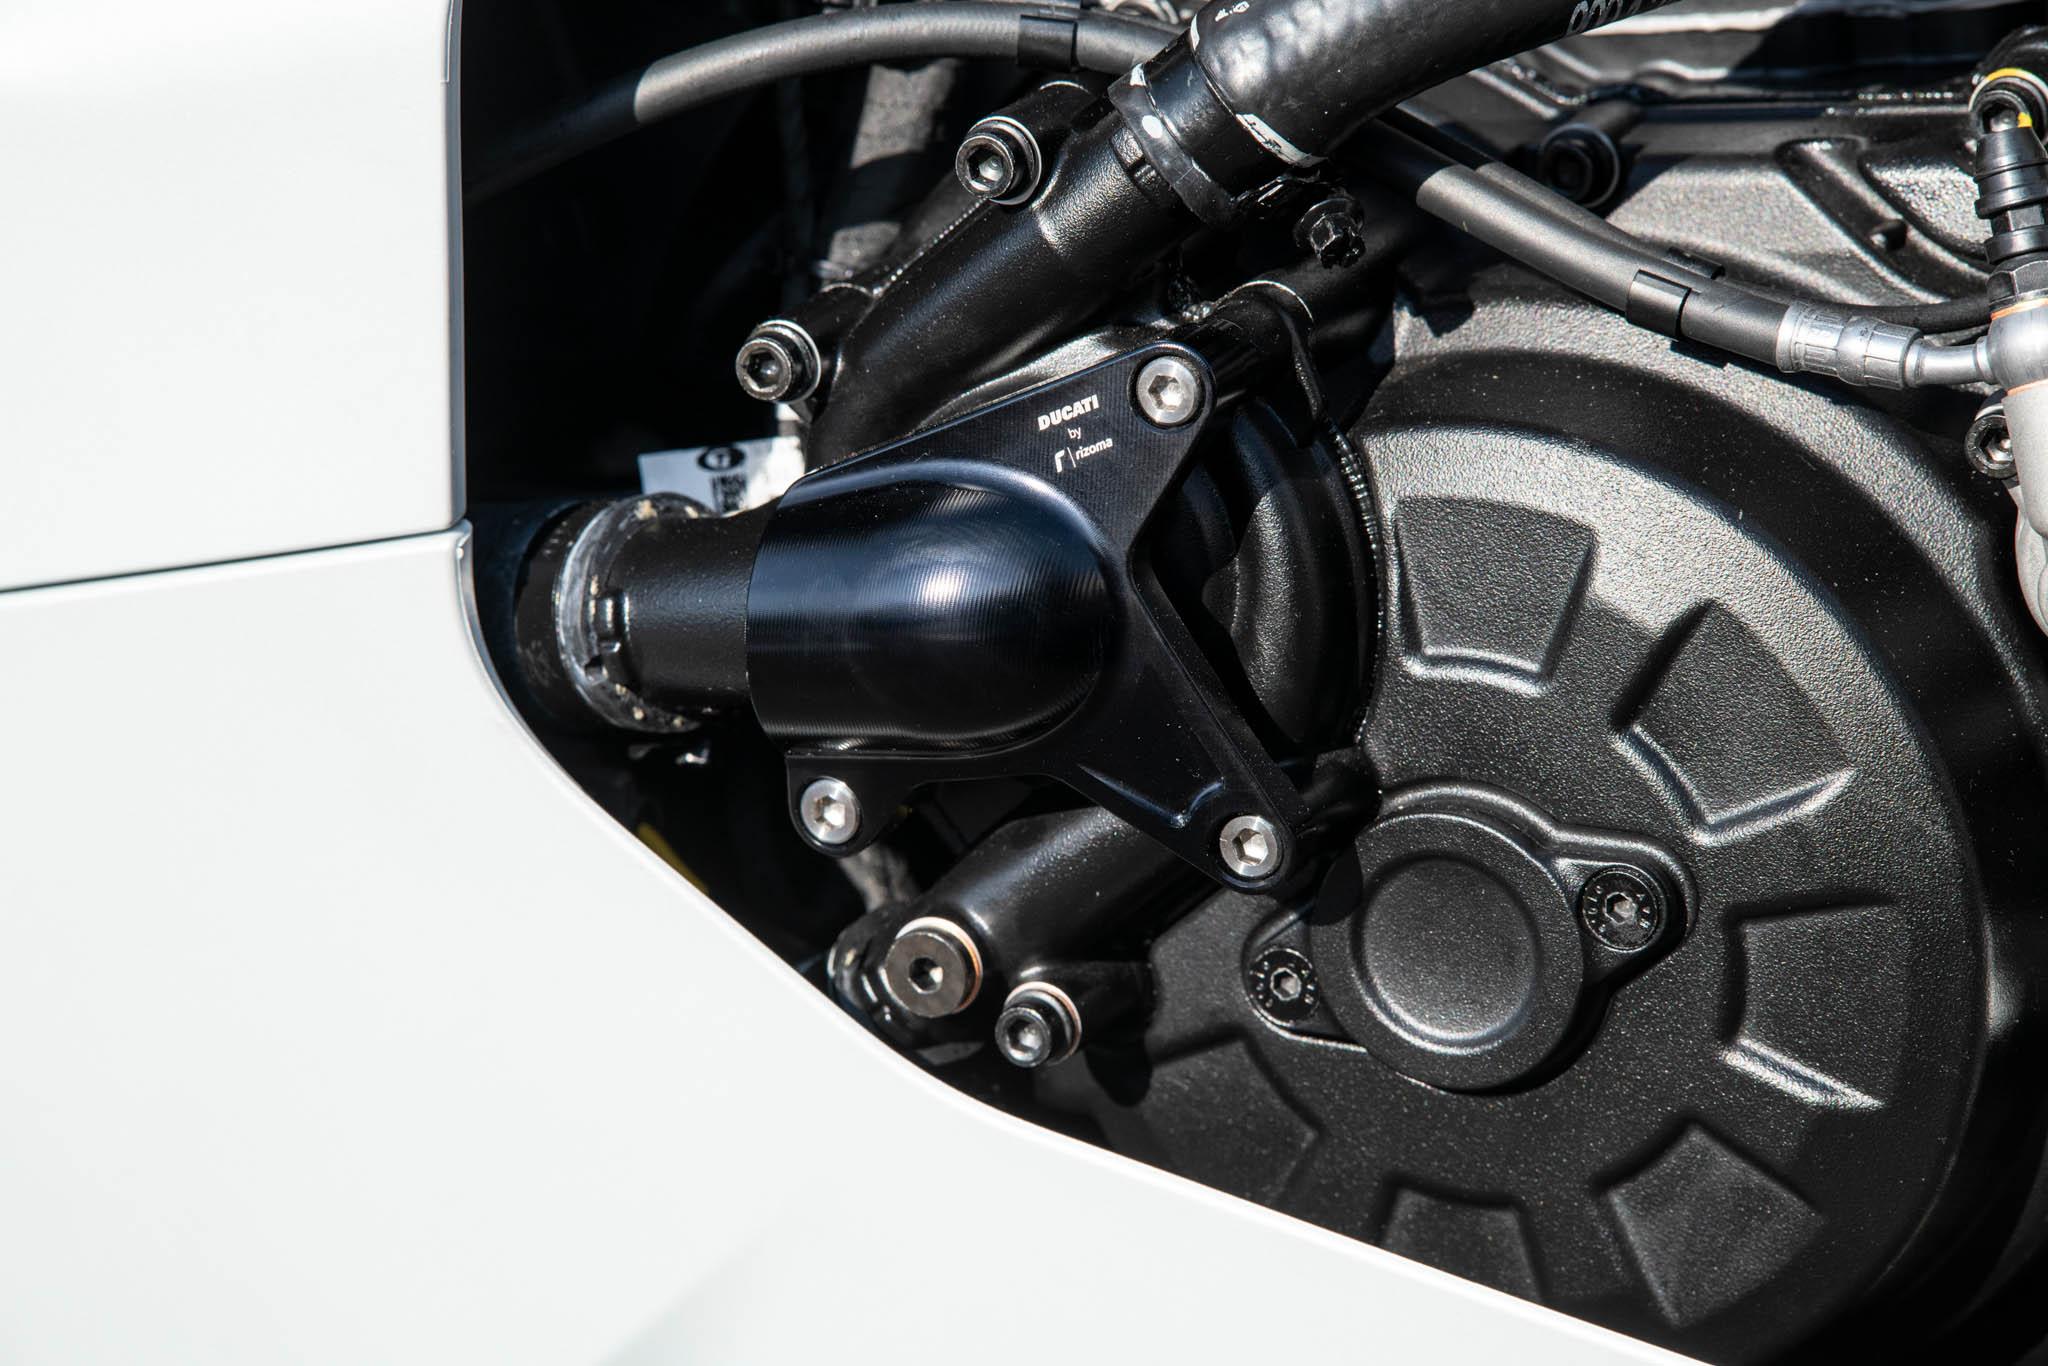 Ducati_SuperSport_950_2021_Performance-6